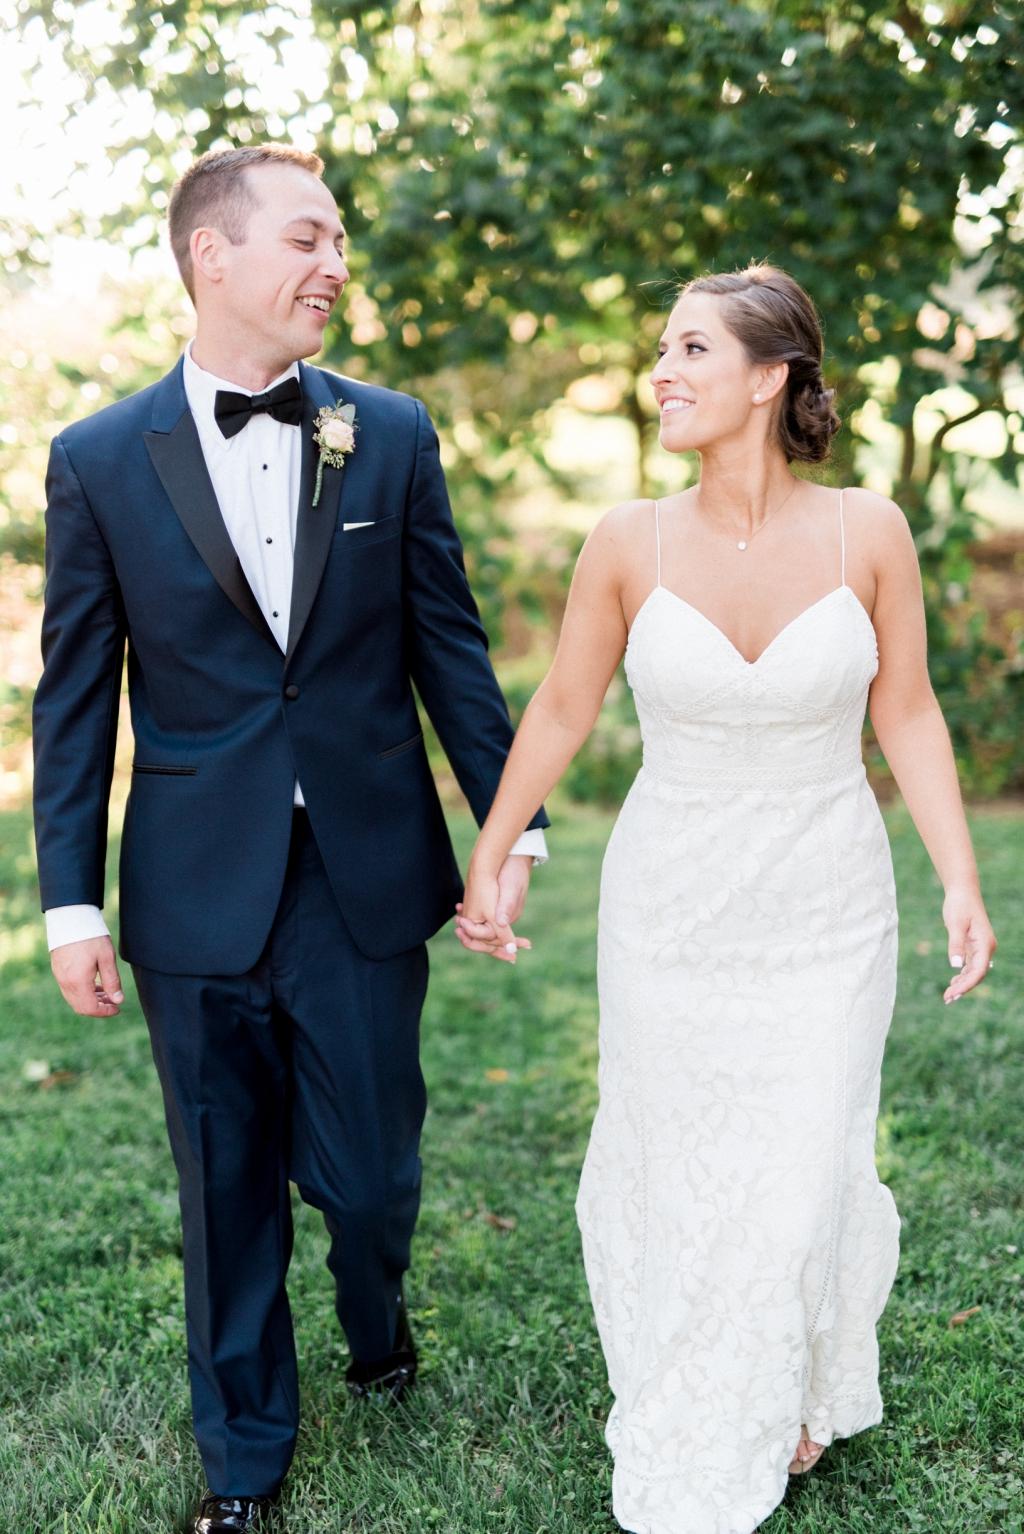 haley-richter-photography-buena-vista-confrence-center-wedding-summer-145